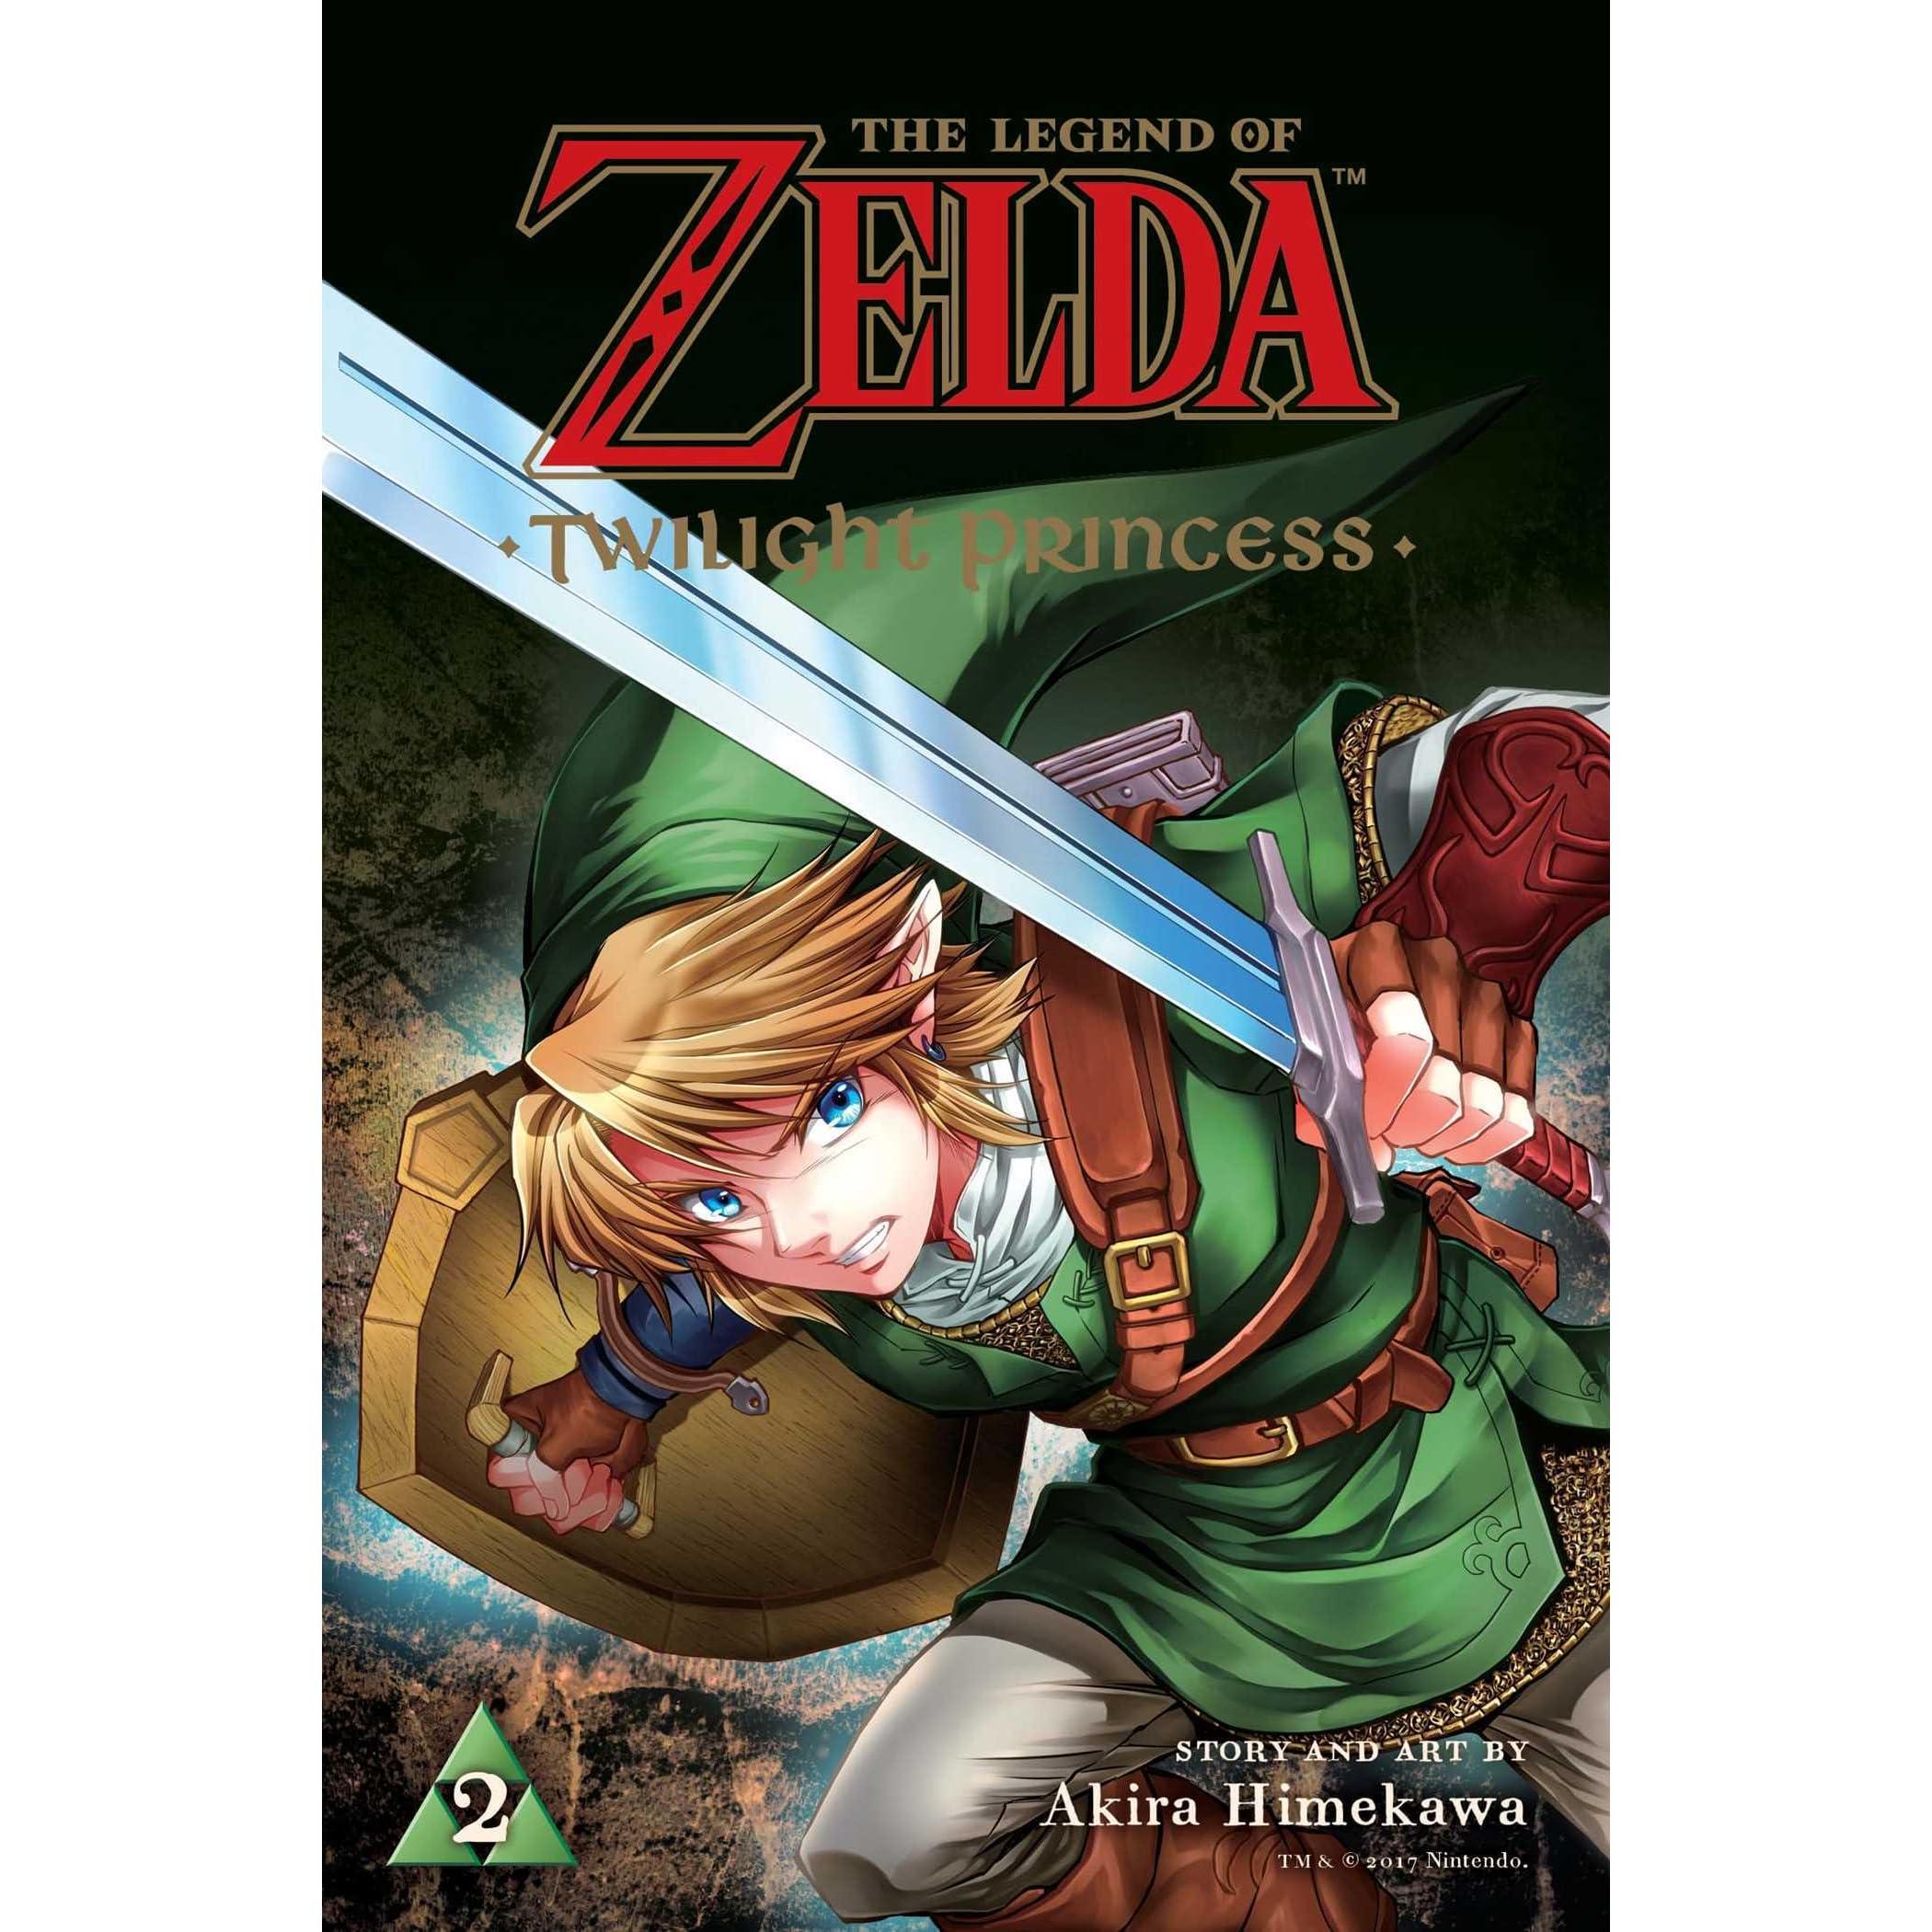 The Legend of Zelda: Twilight Princess, Vol  2 by Akira Himekawa